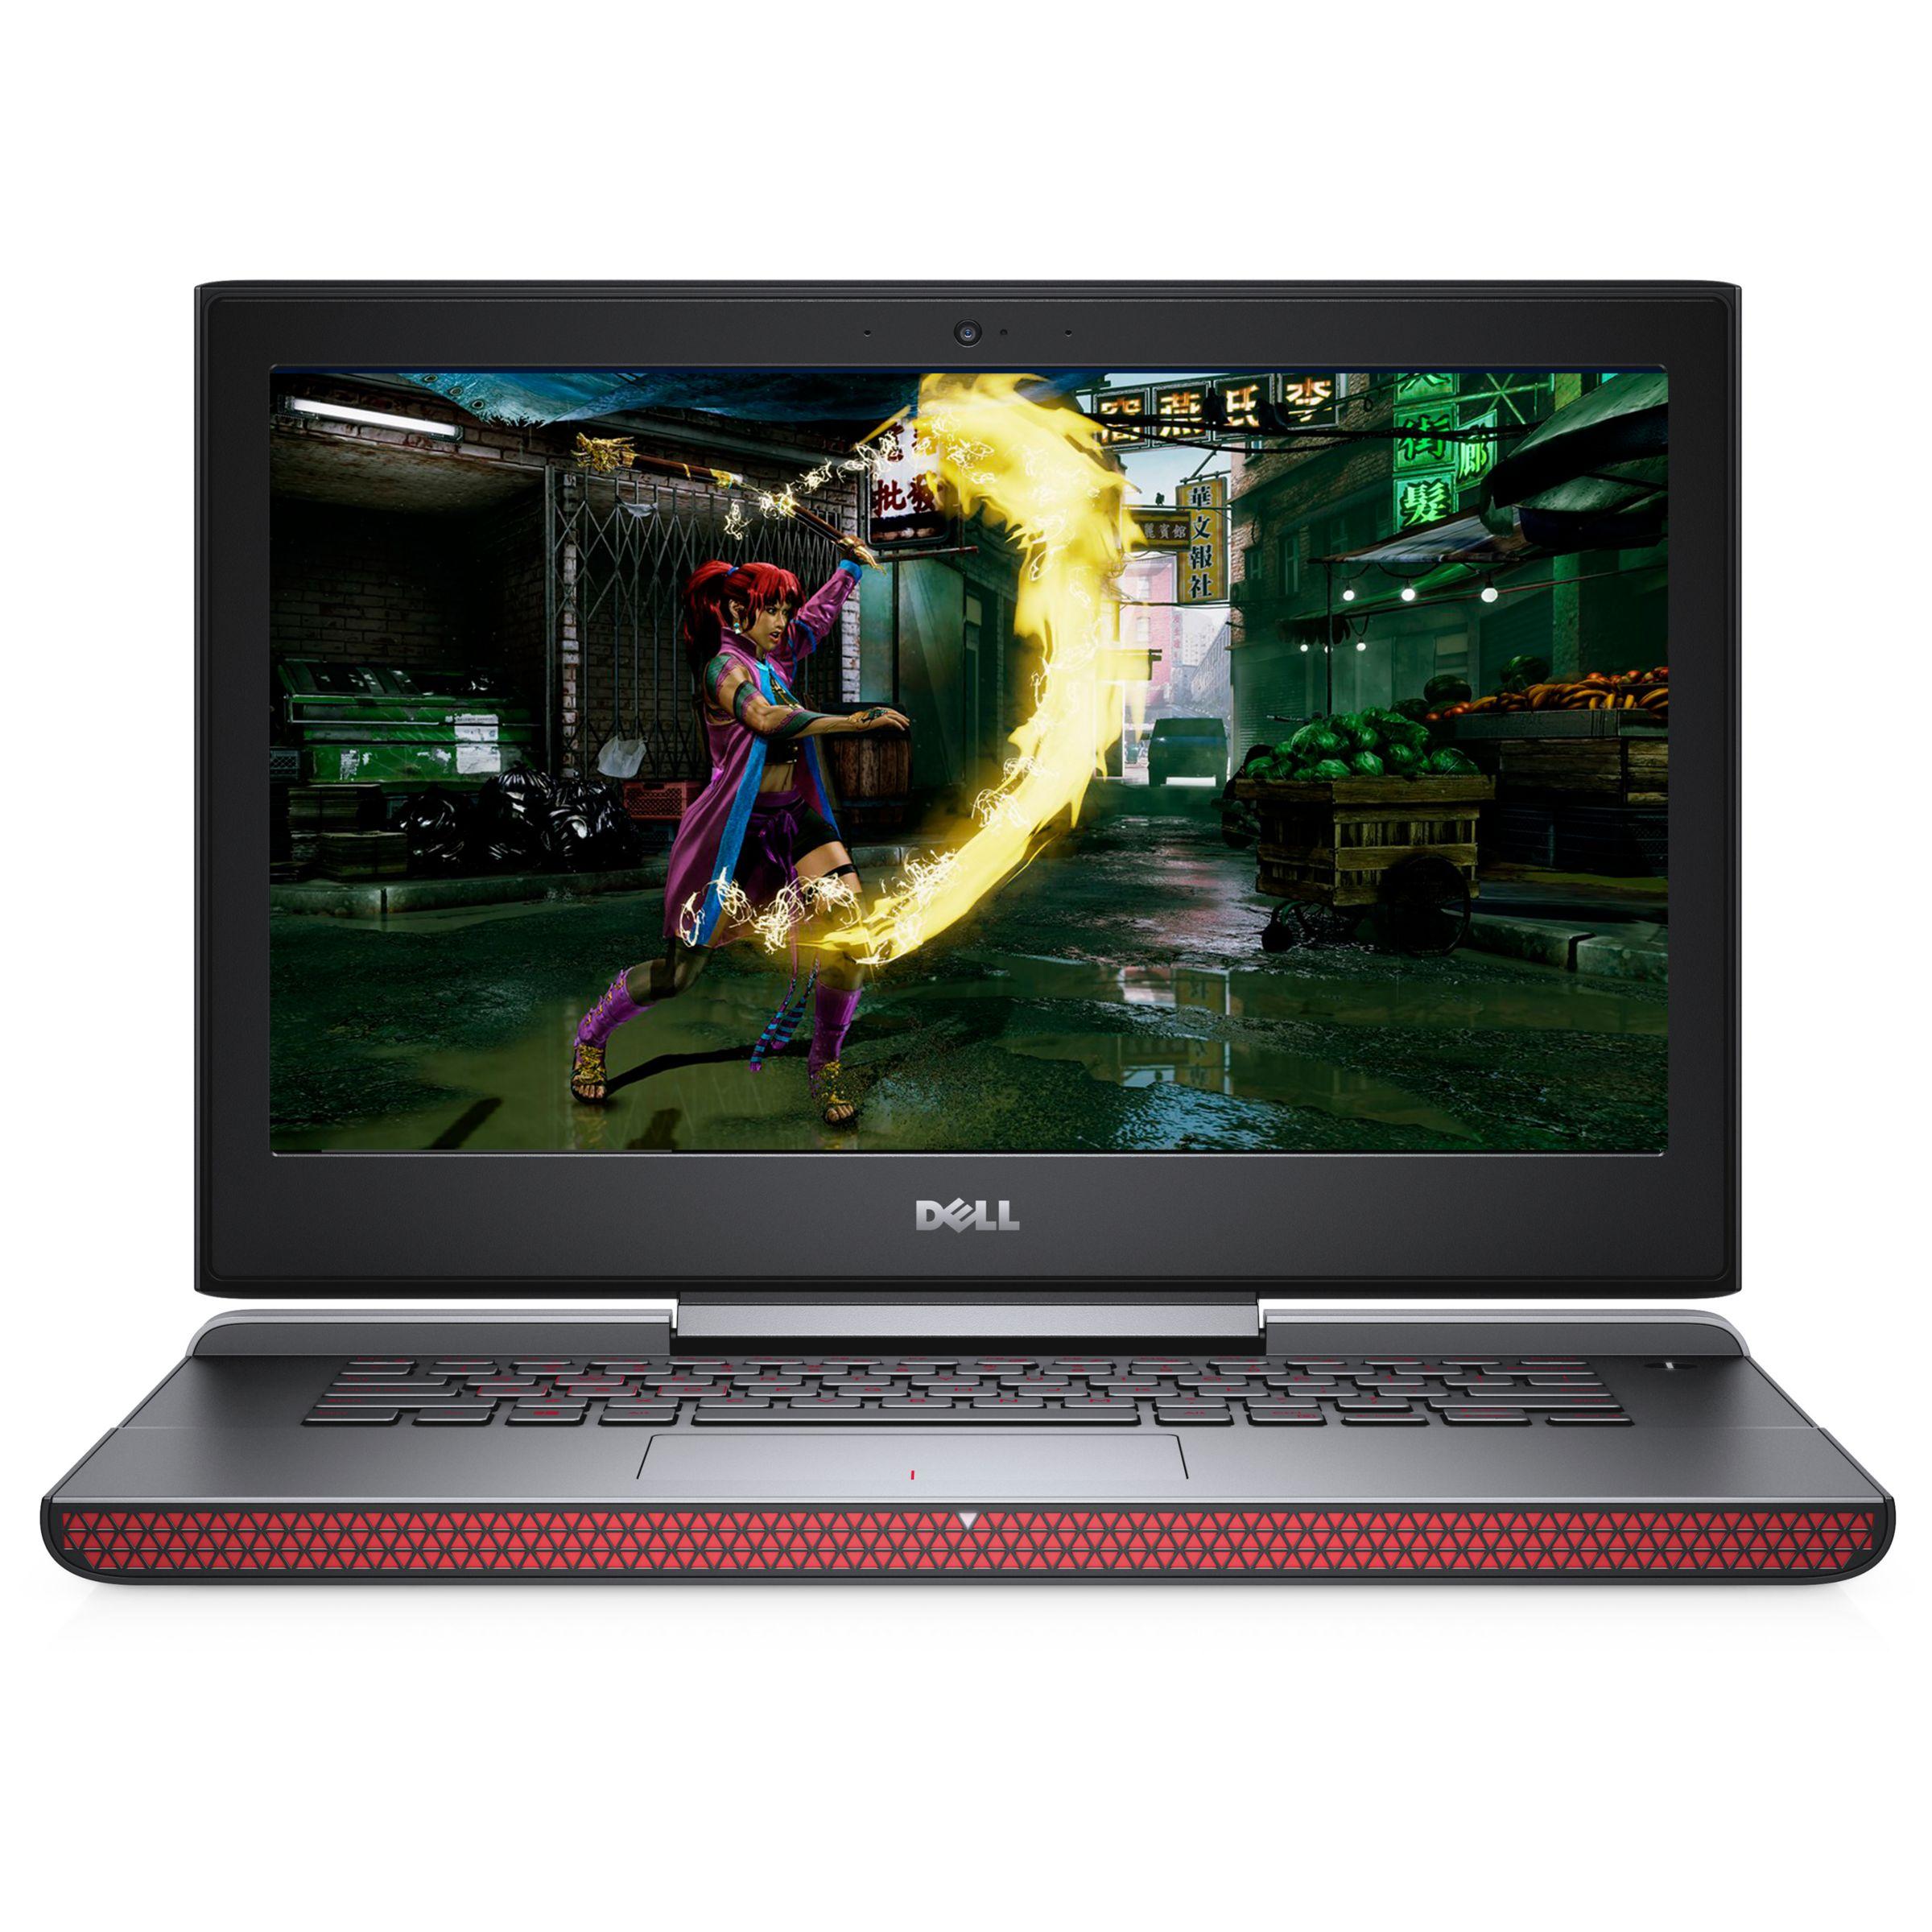 Dell Inspiron 15 Gaming Laptop, Intel Core i5, 8GB RAM